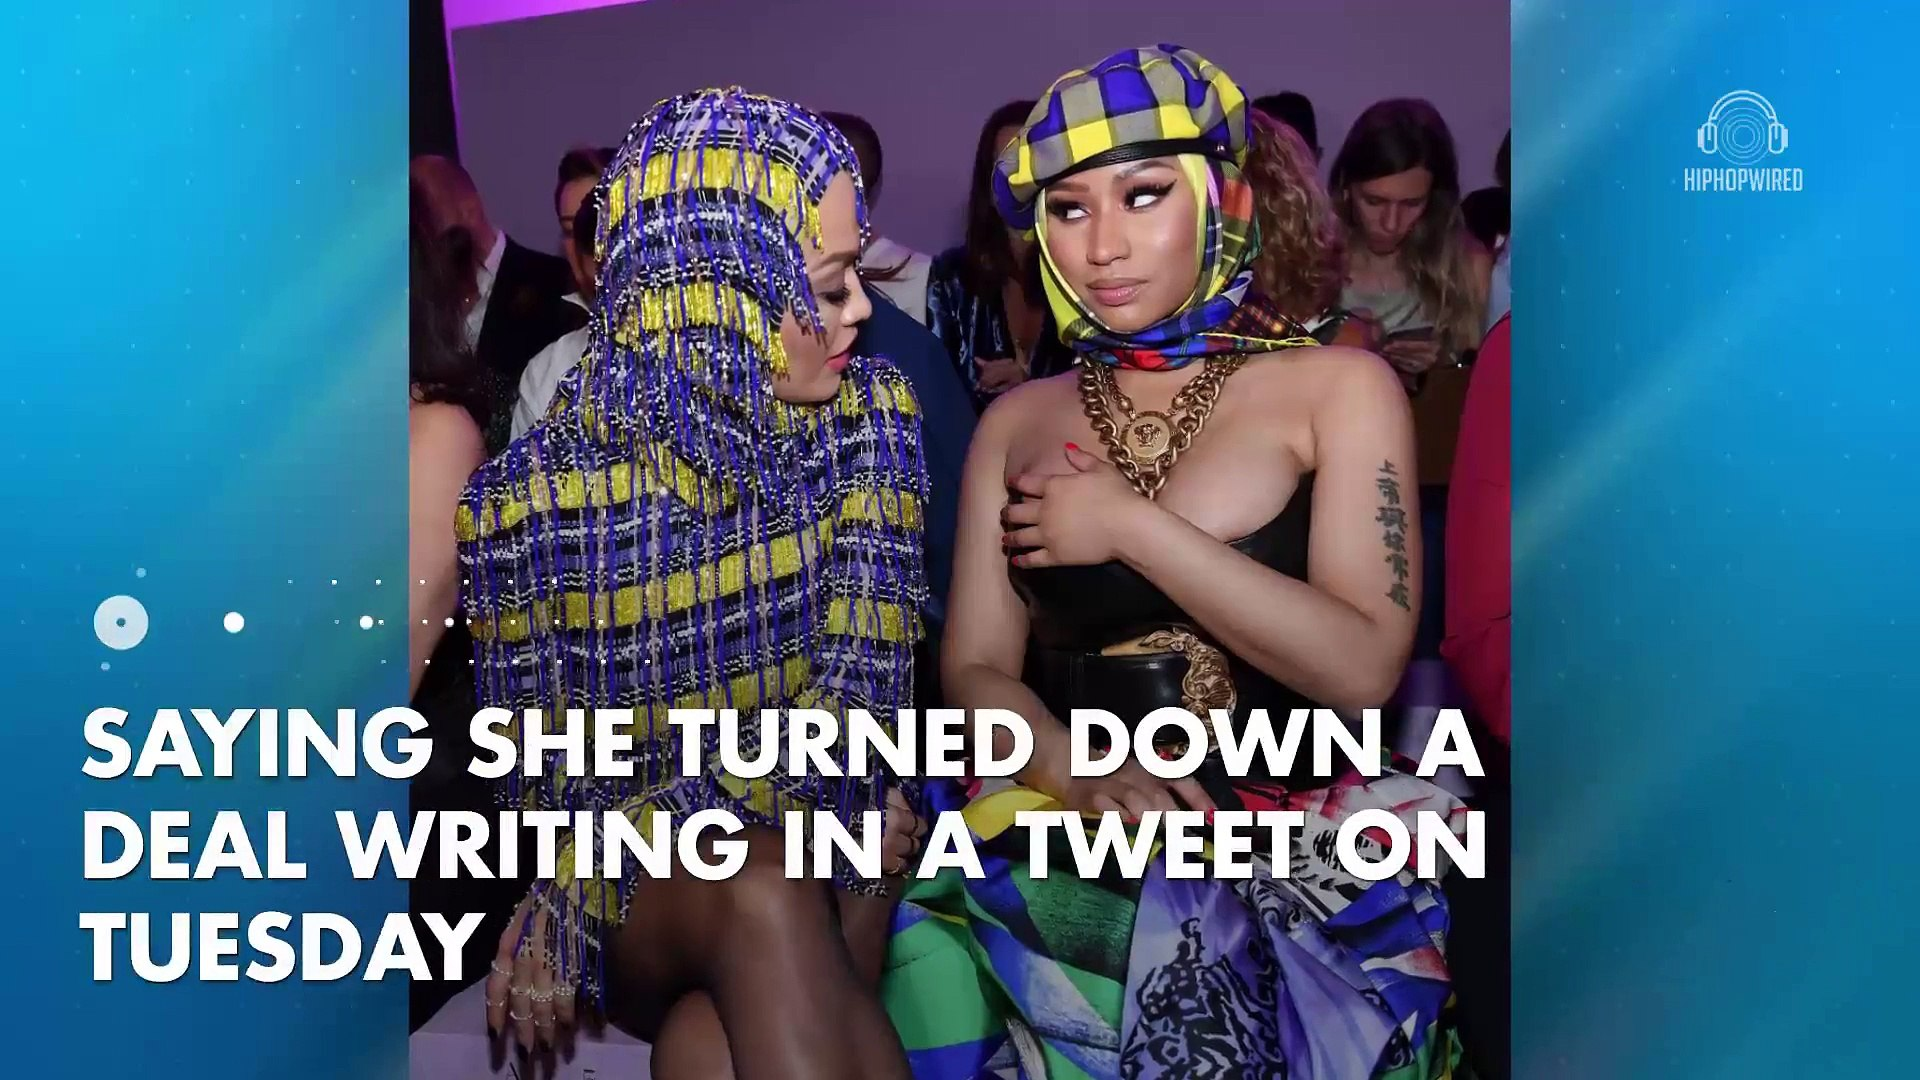 Nicki Minaj Puts Steve Madden In Her Crosshairs After Snarky Tweet